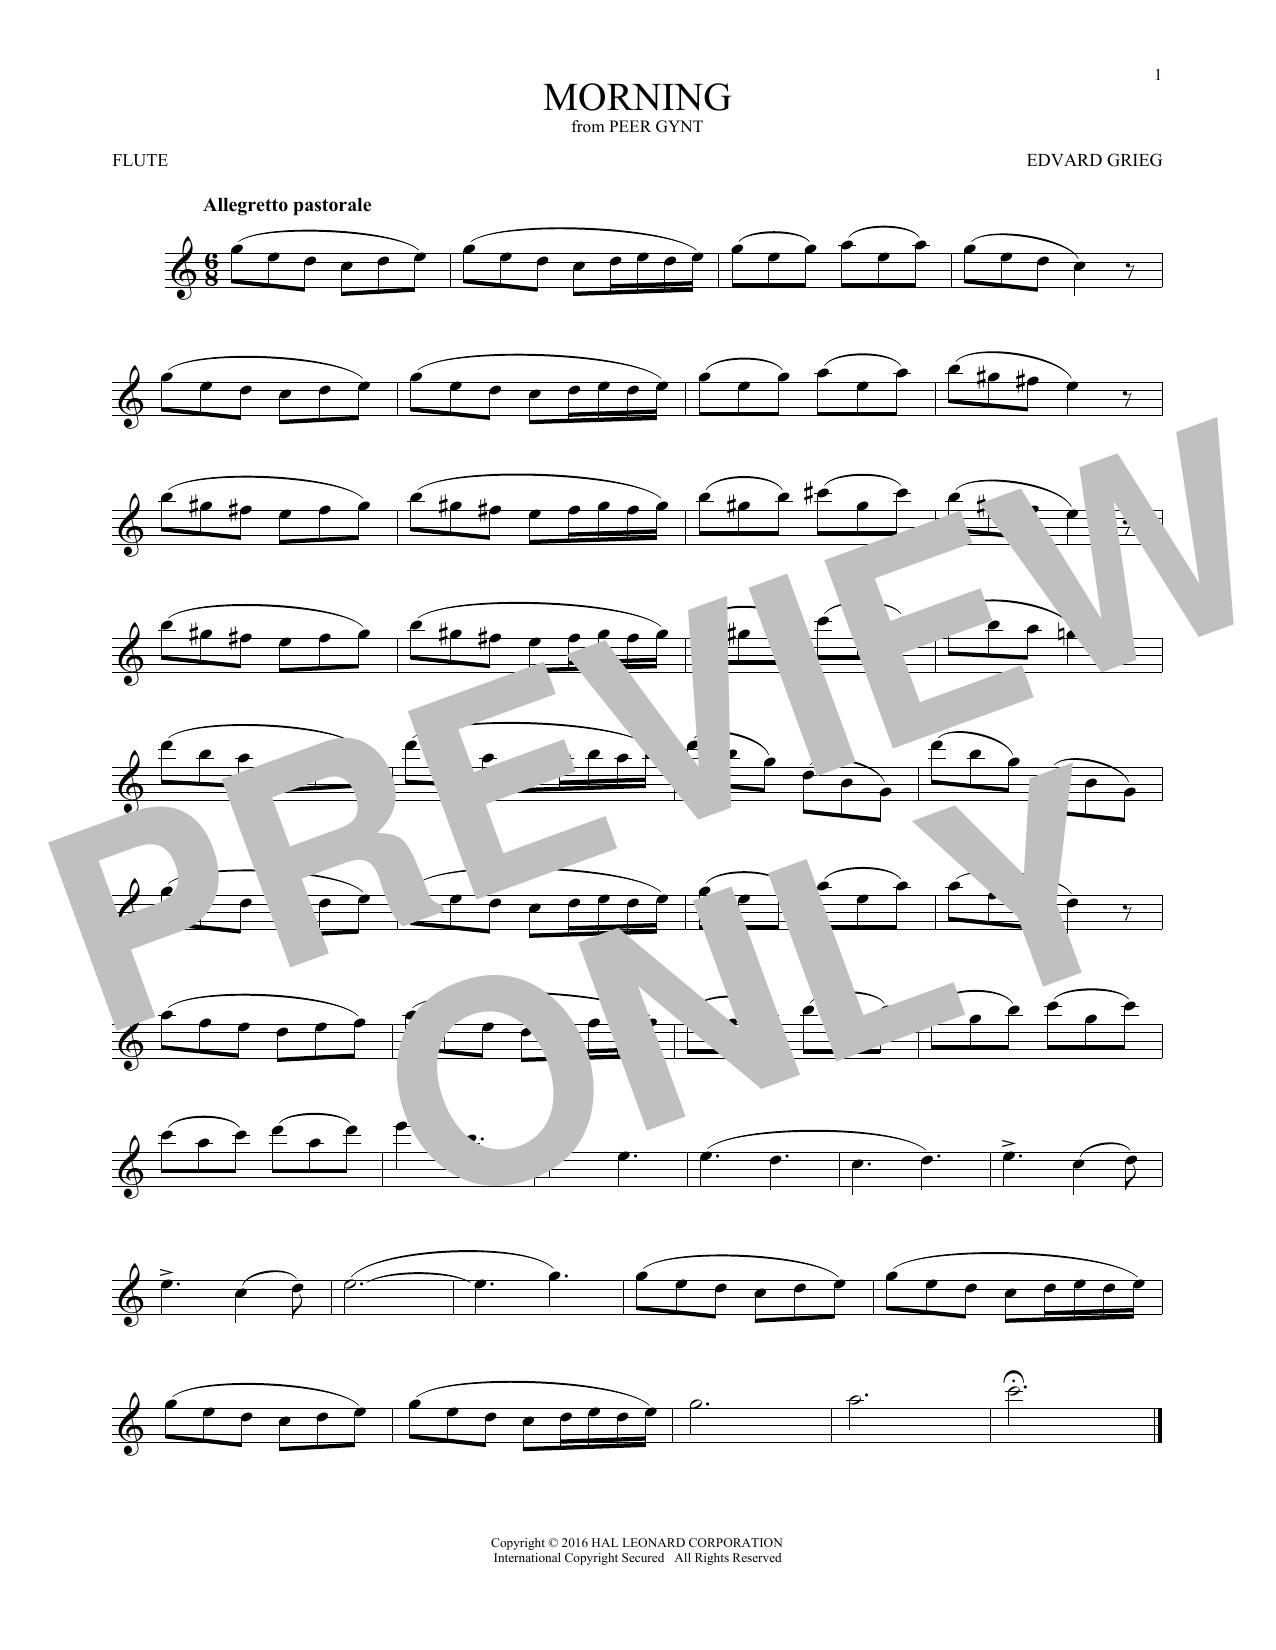 Edvard Grieg Morning sheet music notes and chords. Download Printable PDF.